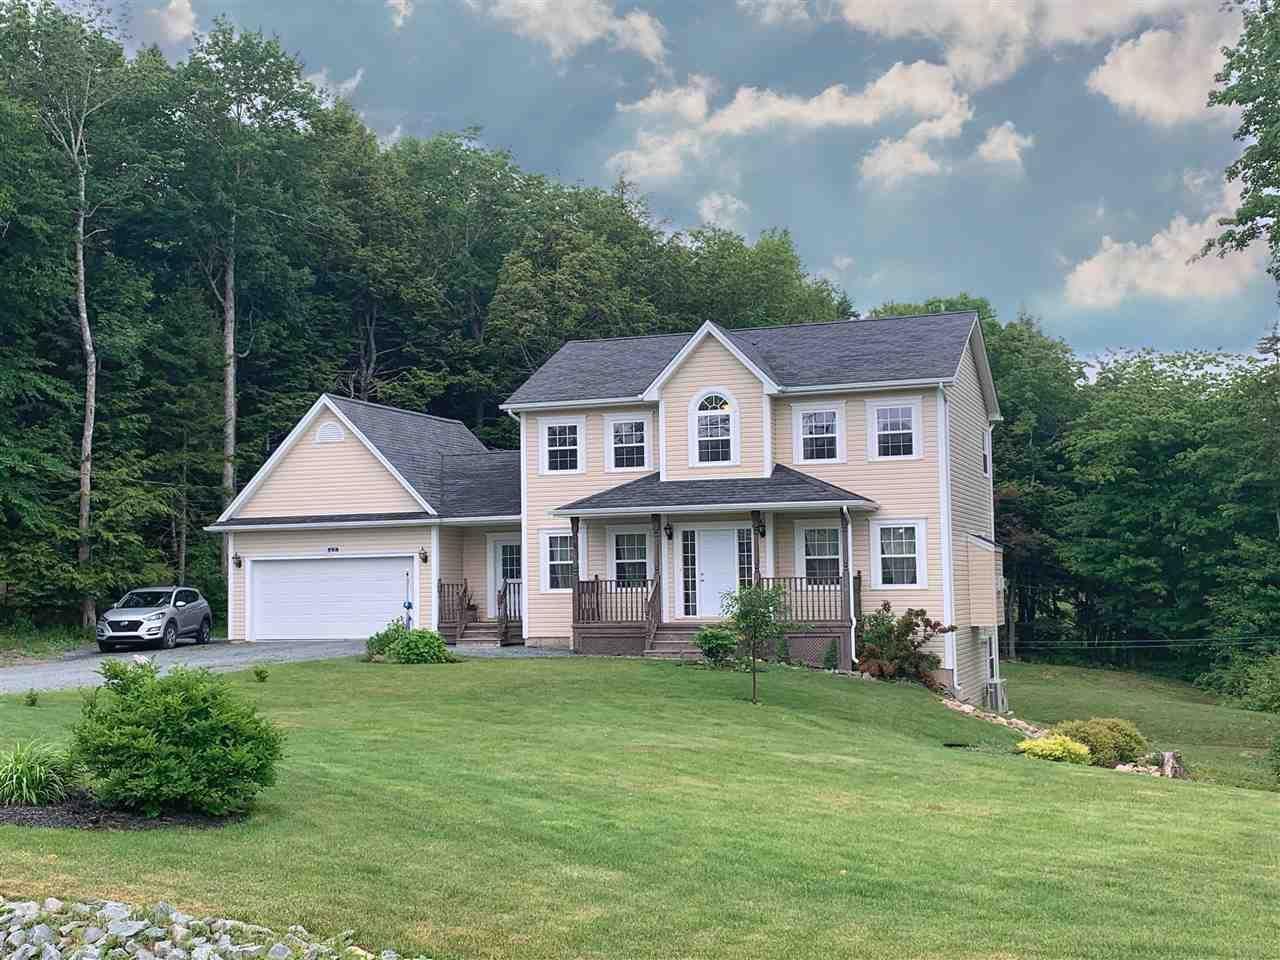 Main Photo: 60 Kenneth Drive in Beaver Bank: 26-Beaverbank, Upper Sackville Residential for sale (Halifax-Dartmouth)  : MLS®# 202011274